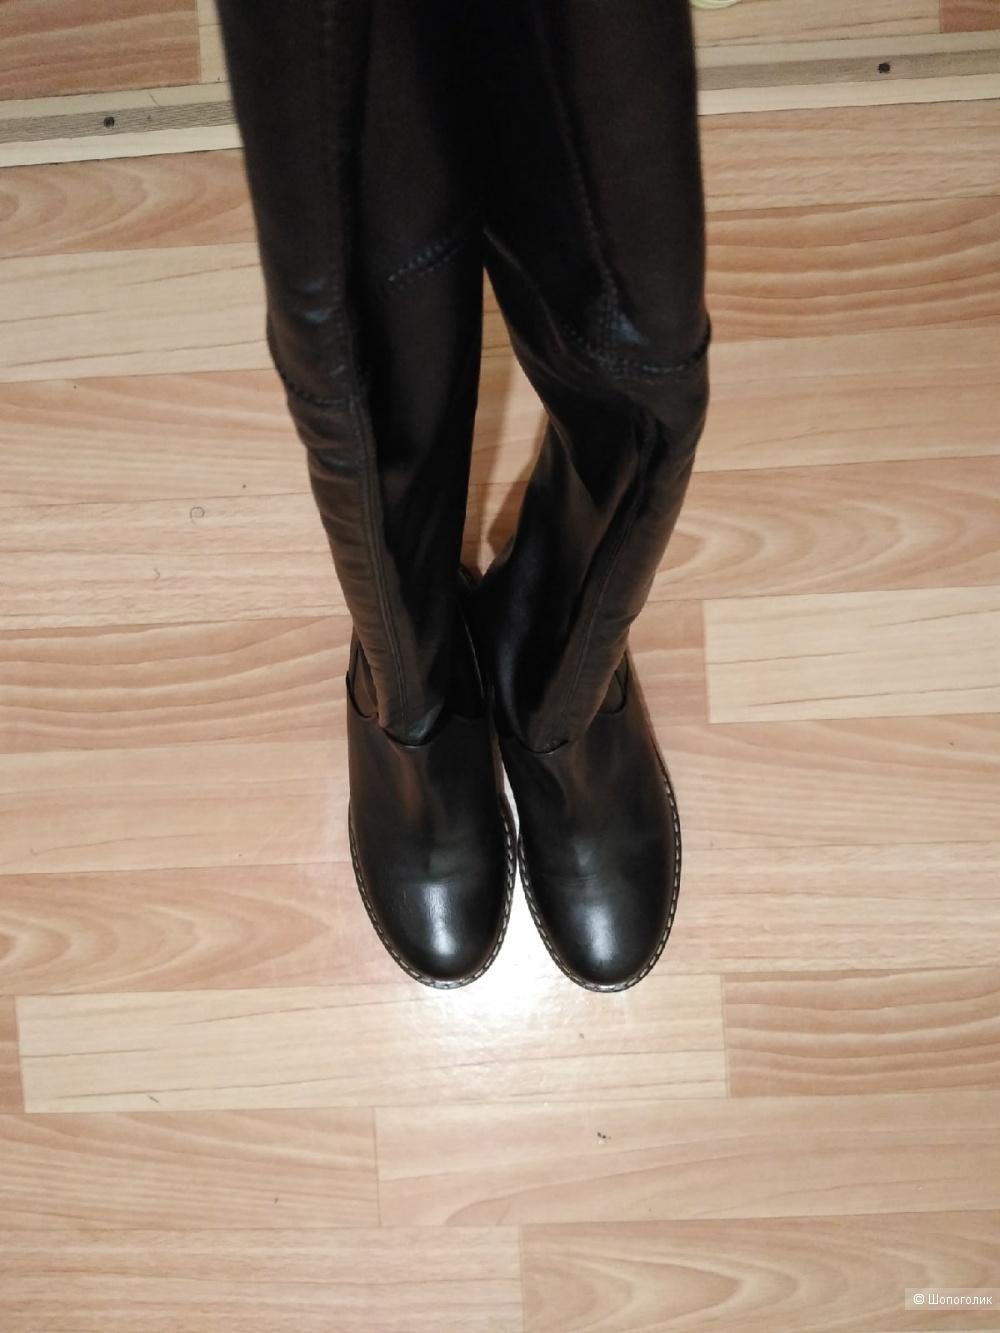 Сапоги ботфорты из натуральной кожи Griff Italia. Размер: 36 (23,5 см)